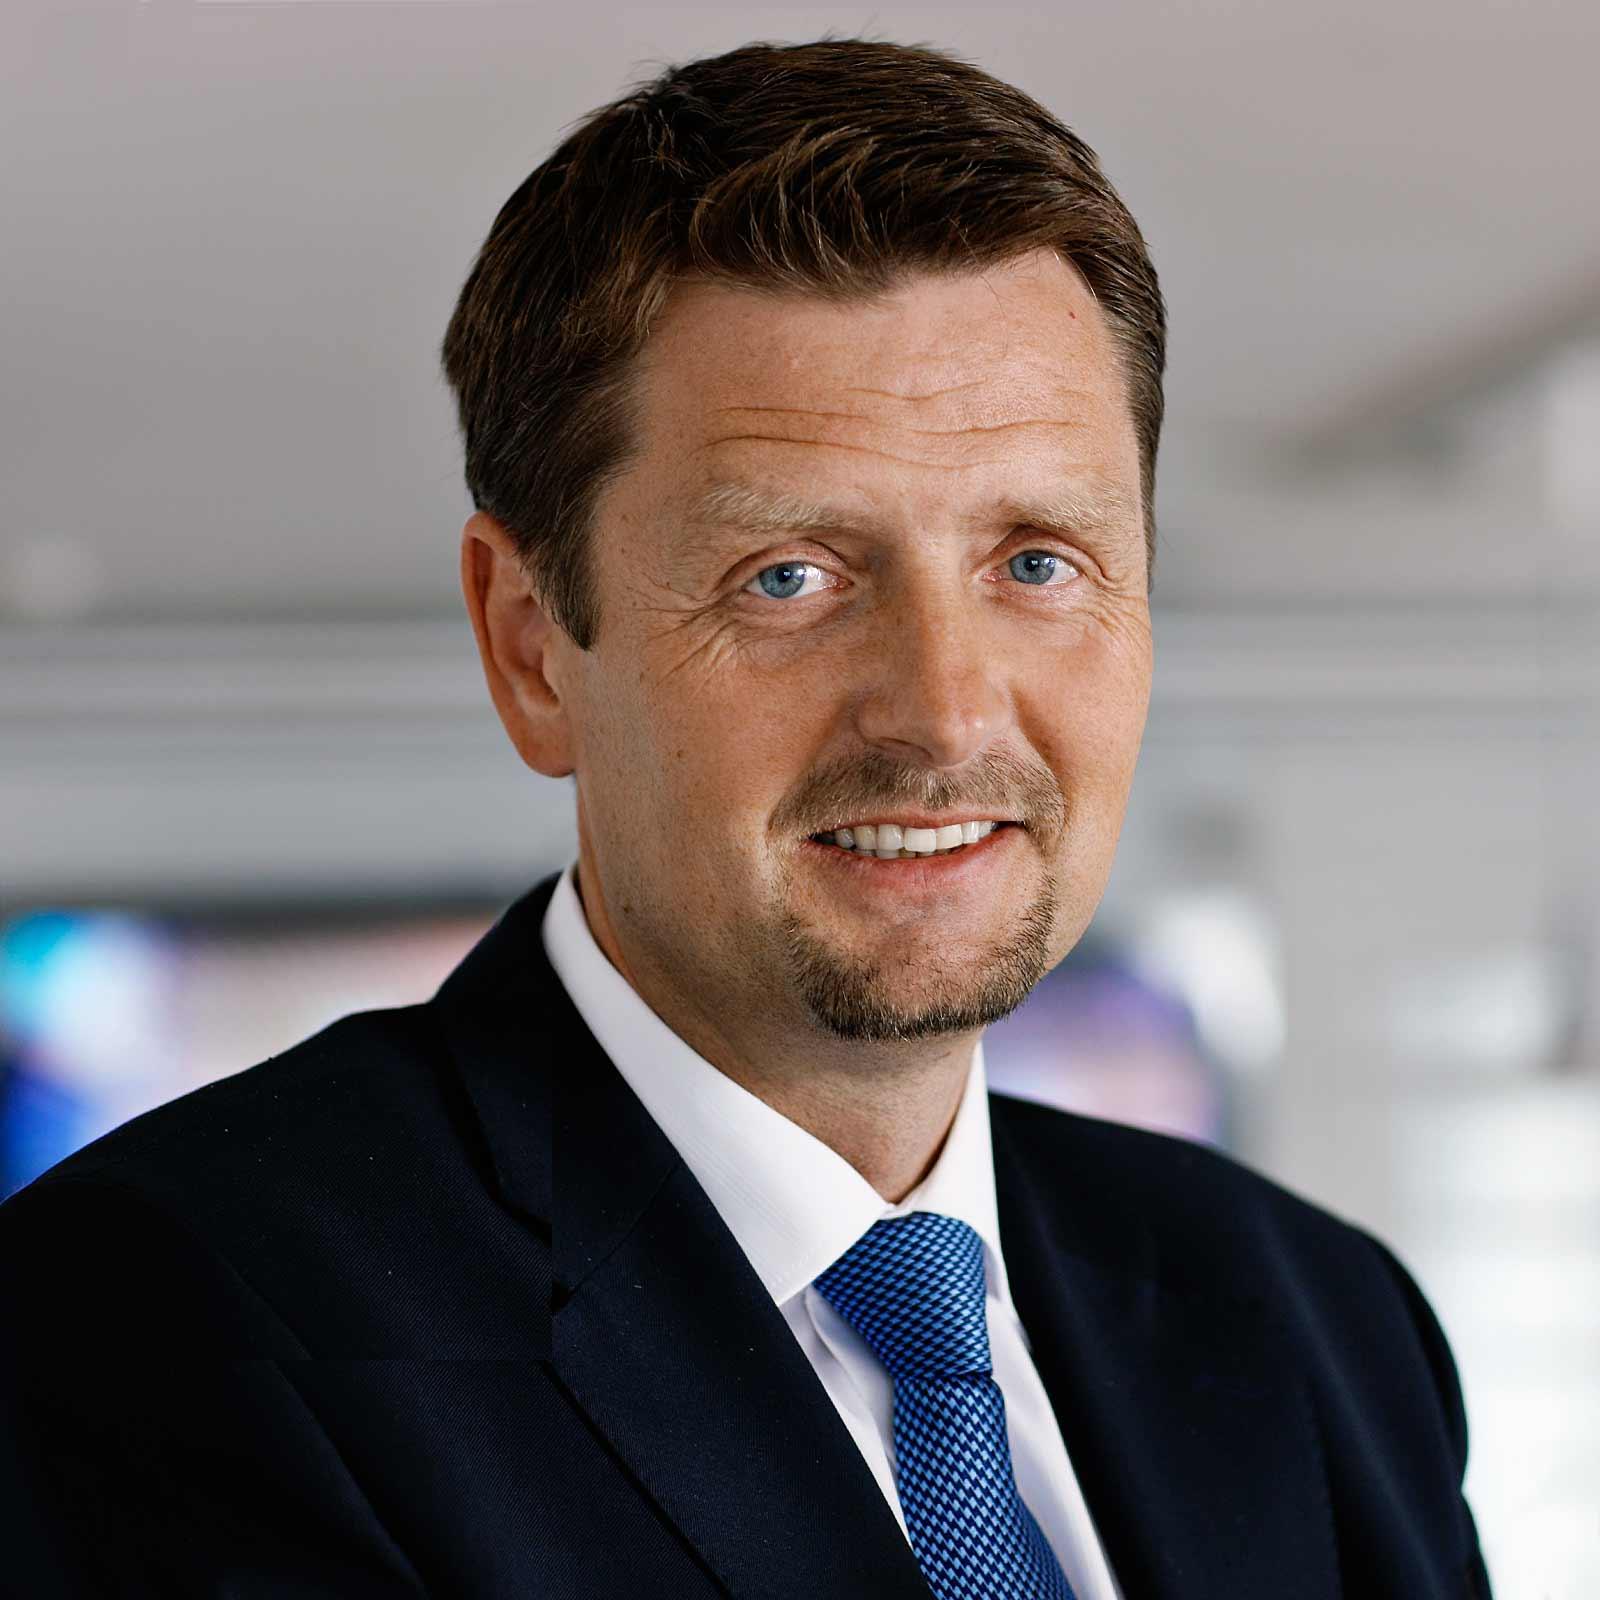 Karsten Poul Jørgensen